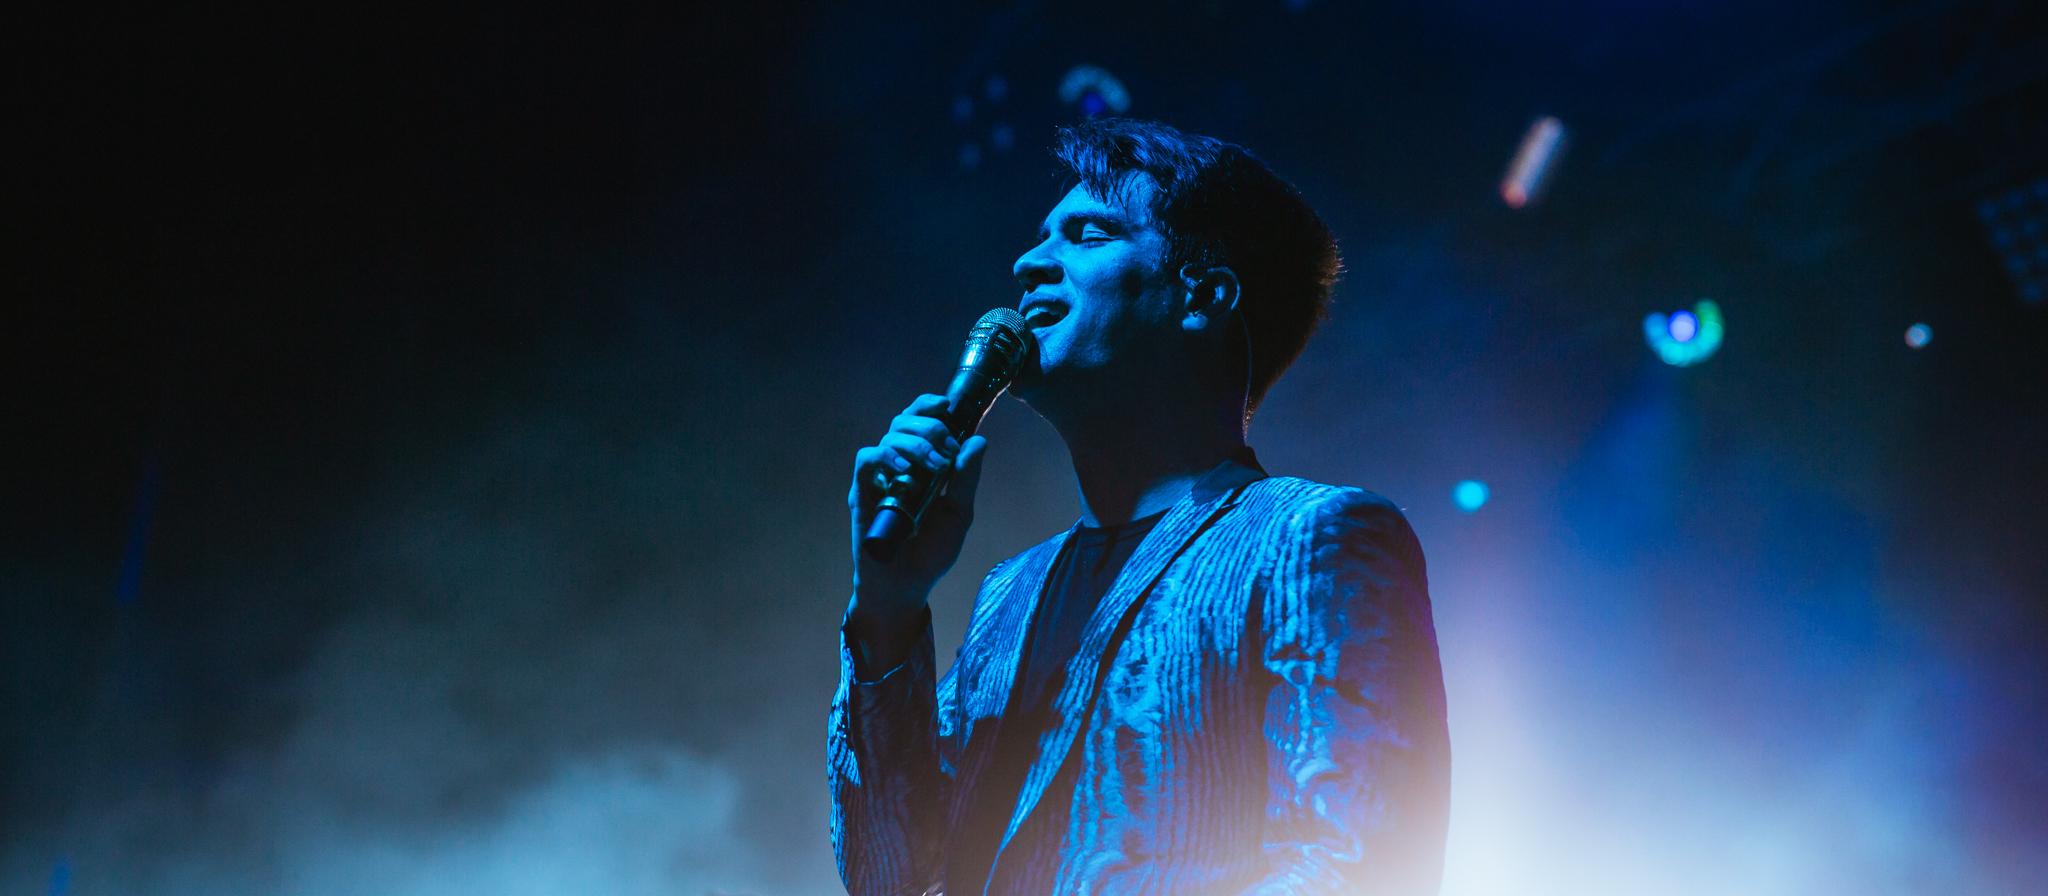 Mitch Lowe Photo - Panic At The Disco - Riverstage-45.jpg